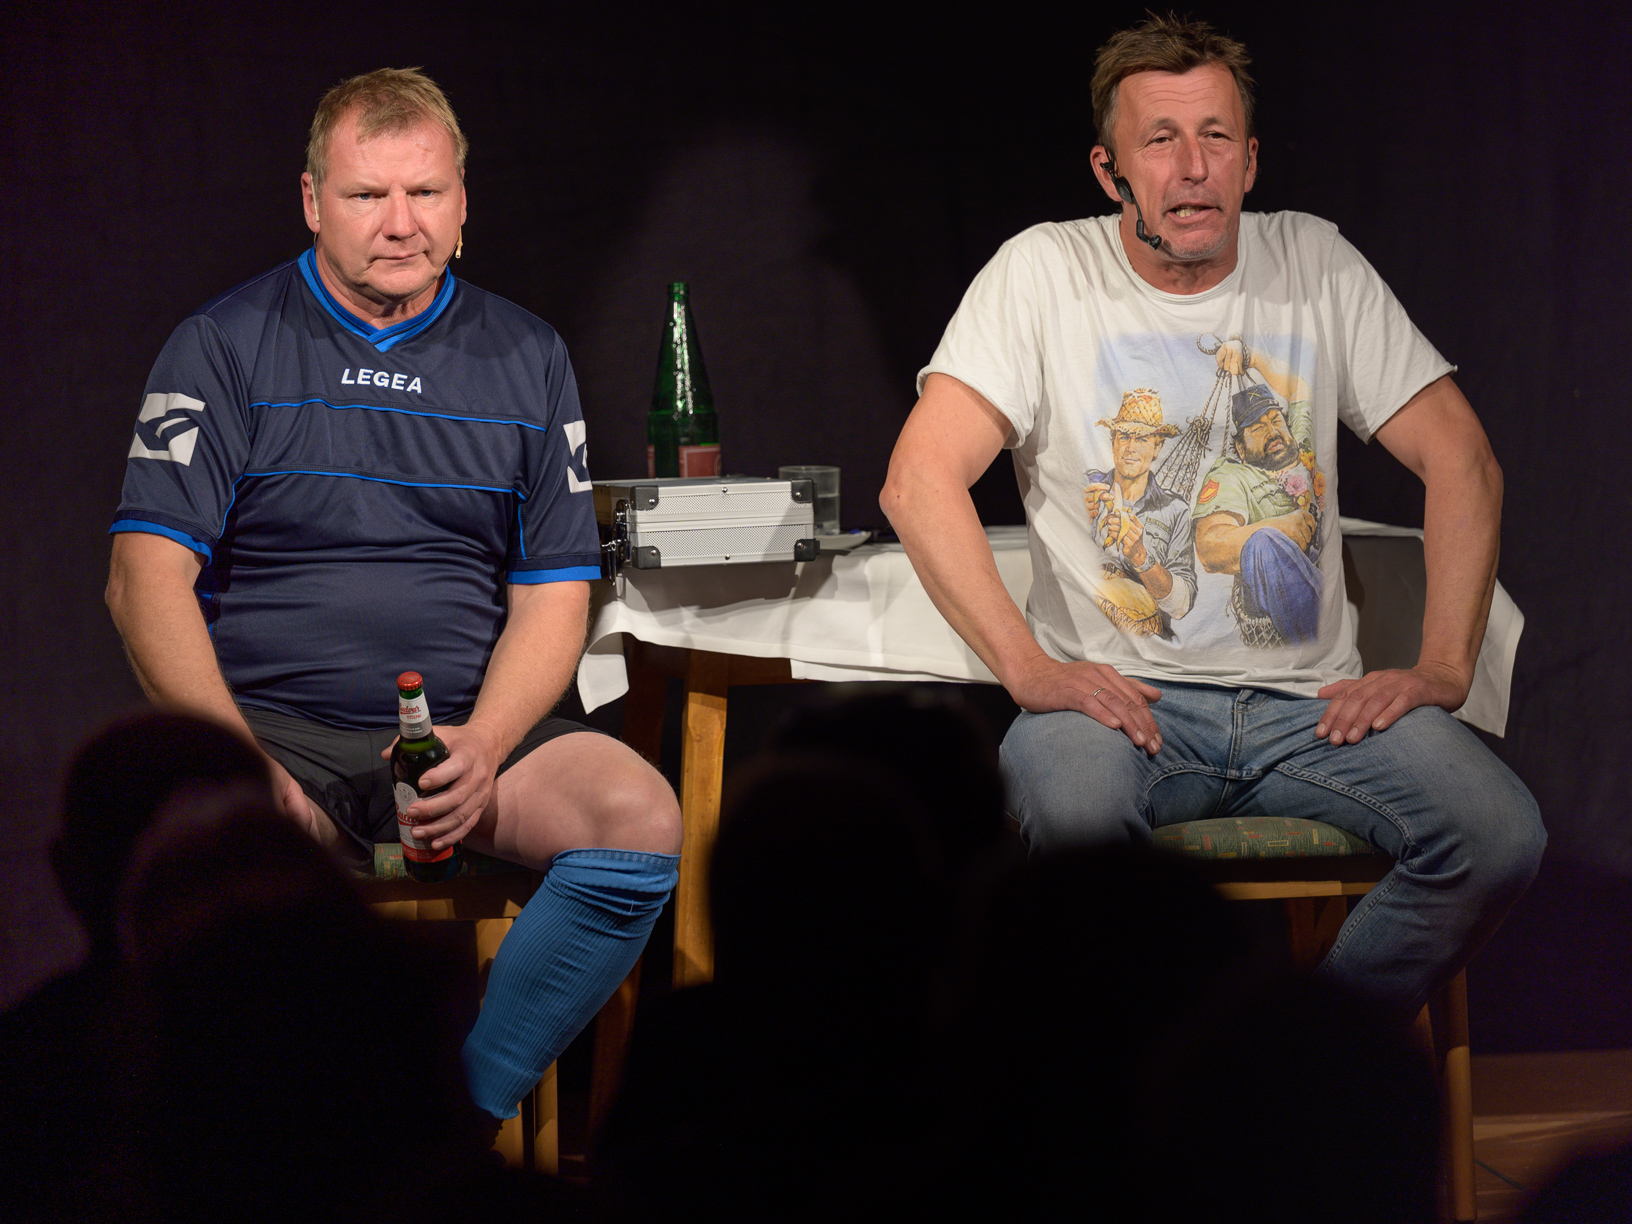 Pepi Hopf & Fredi Jirkal, nimm 2 wie Pech und Schwefel (c) Robert Reiser Photography